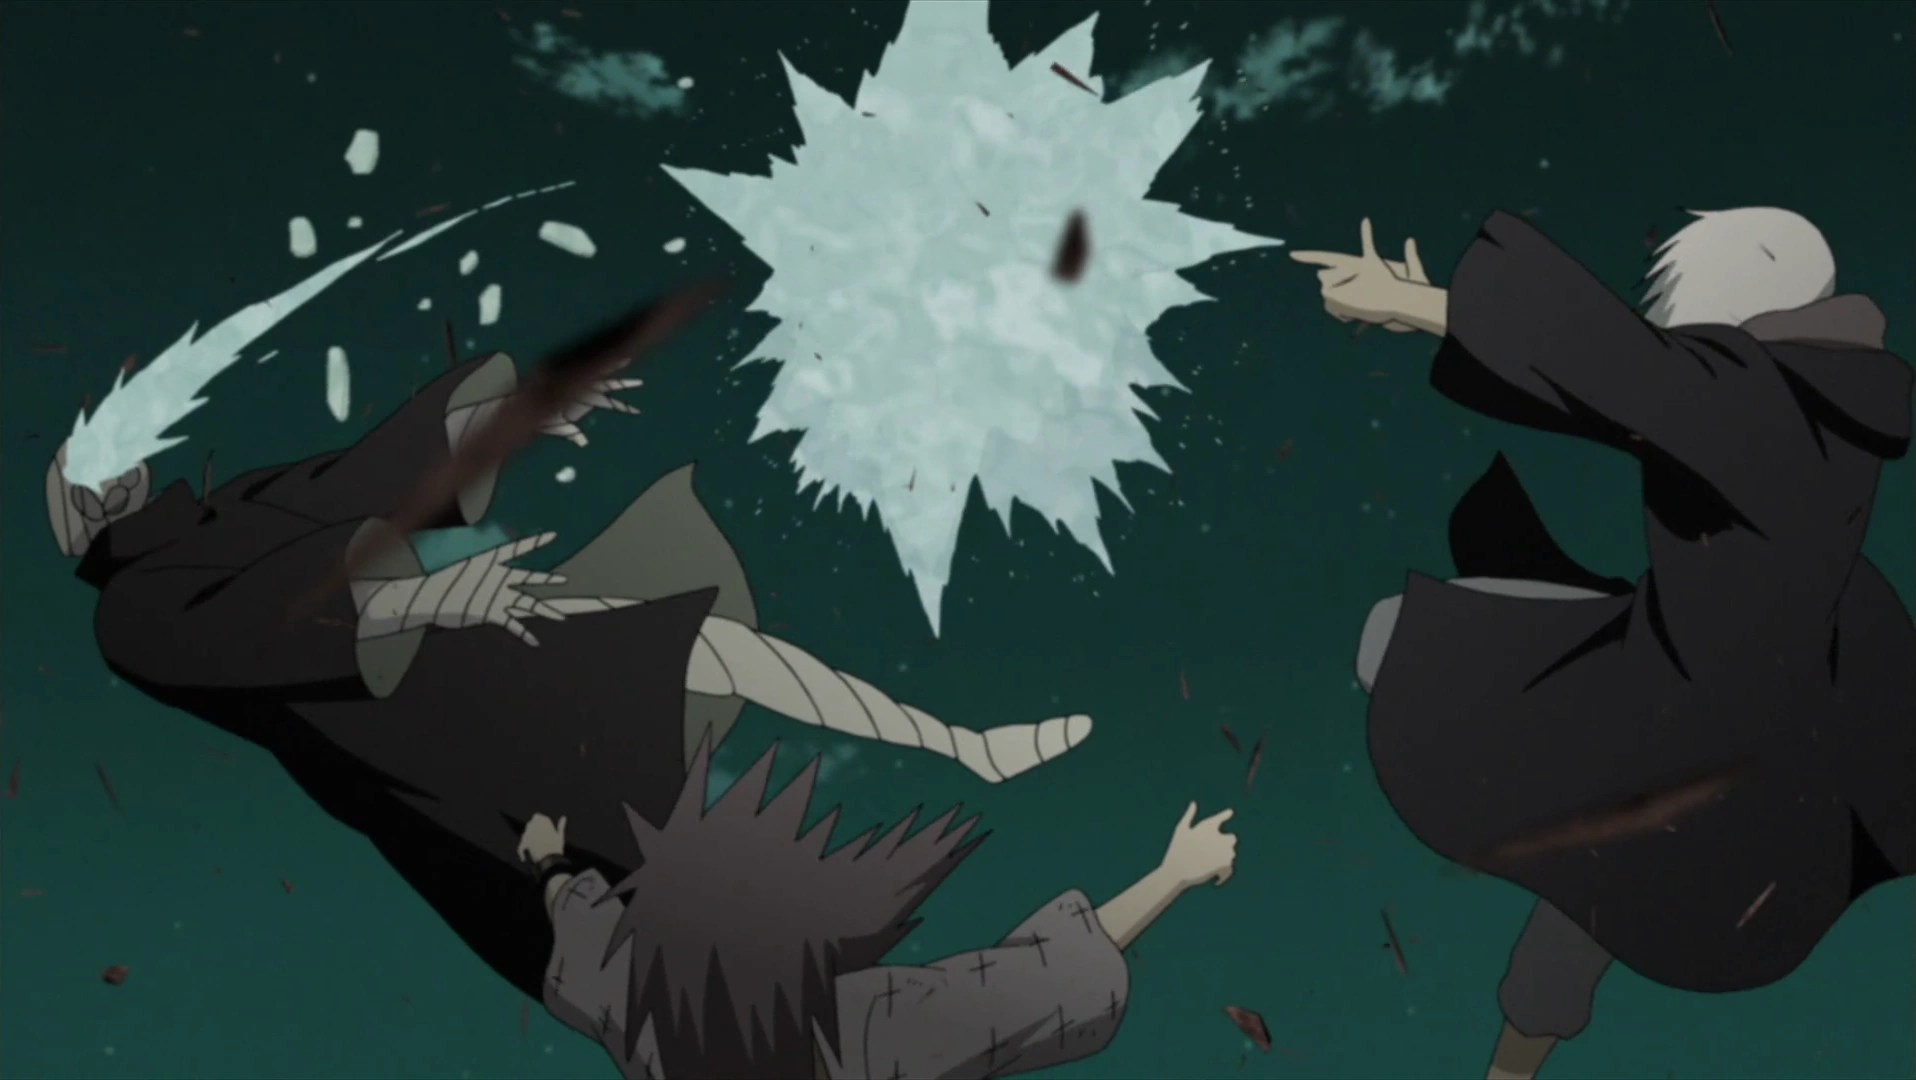 Saw Movie Wallpaper Quotes Water Gun Two Guns Narutopedia Fandom Powered By Wikia